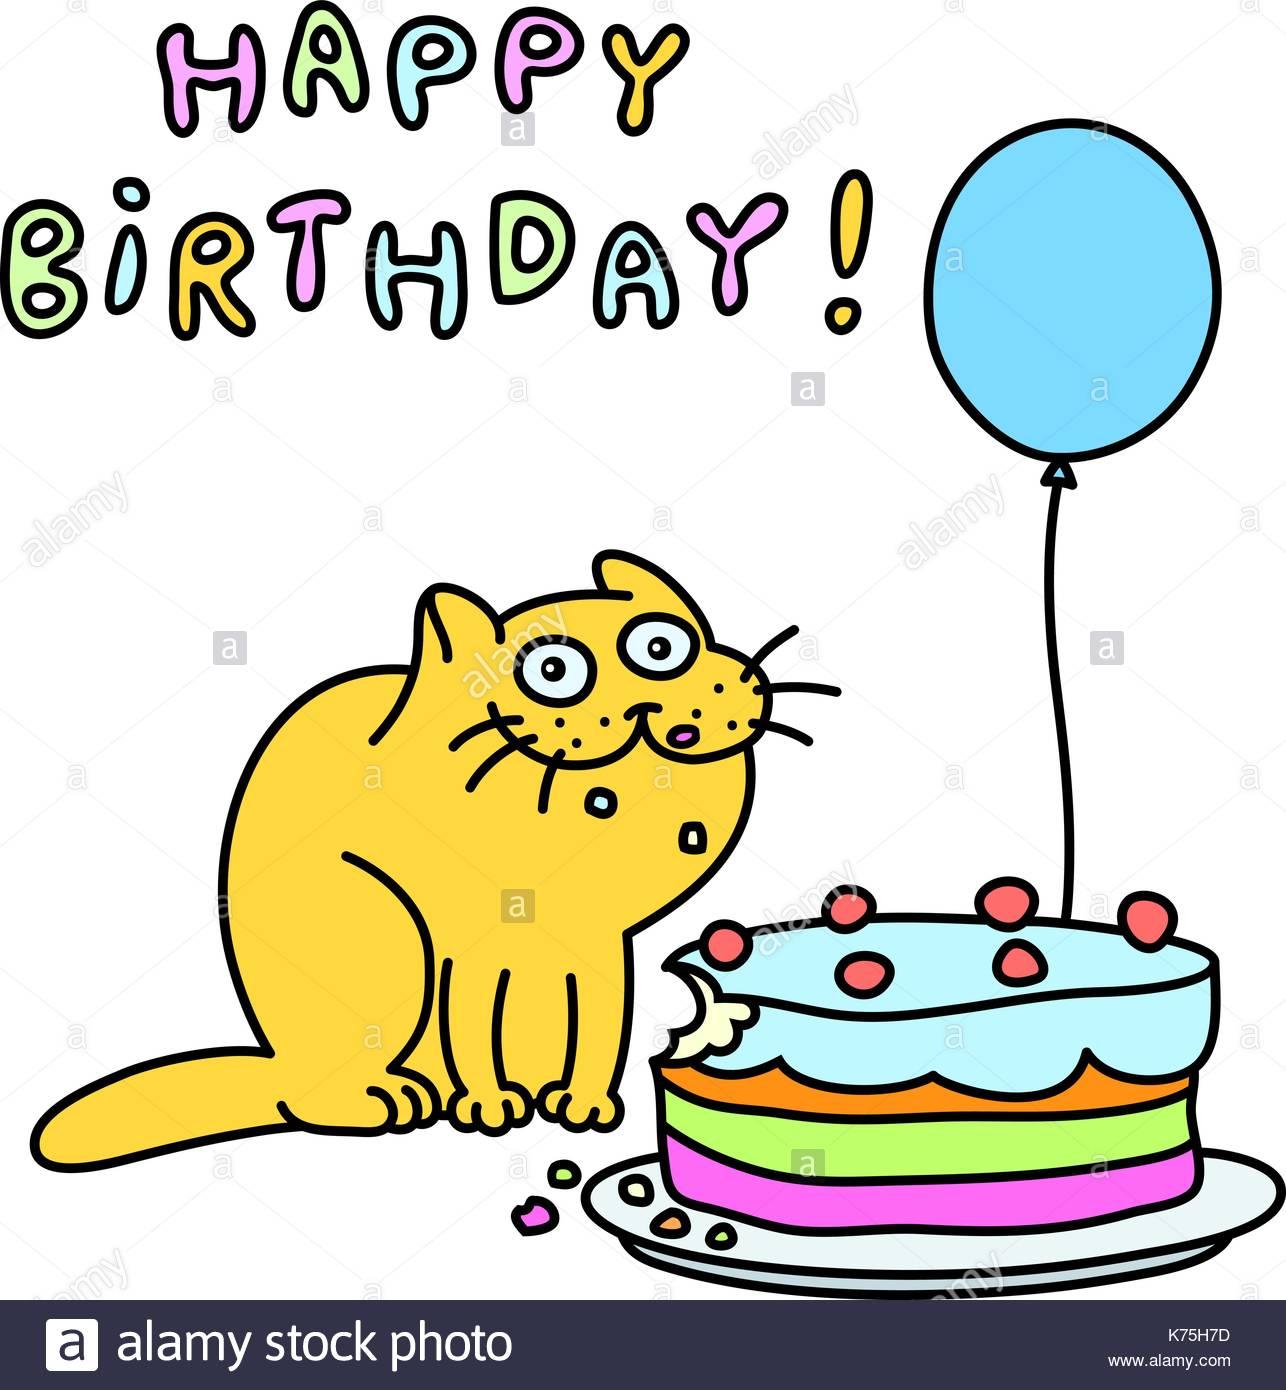 Happy Birthday Cat Clipart